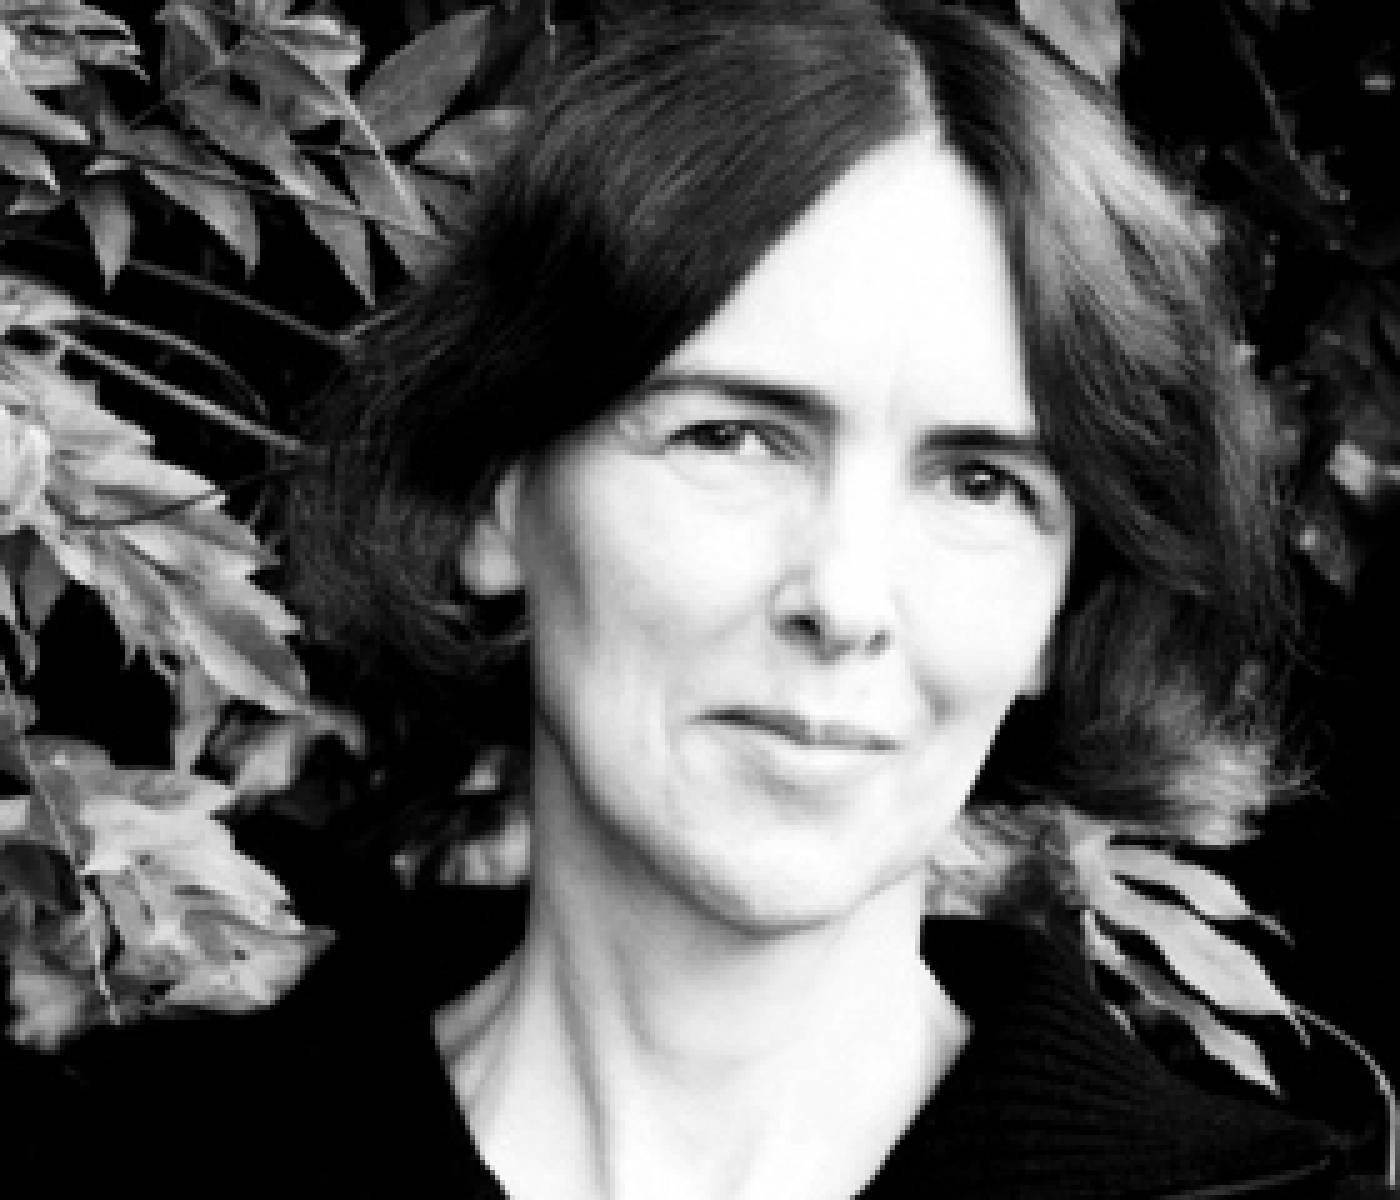 Susanne Bobzien